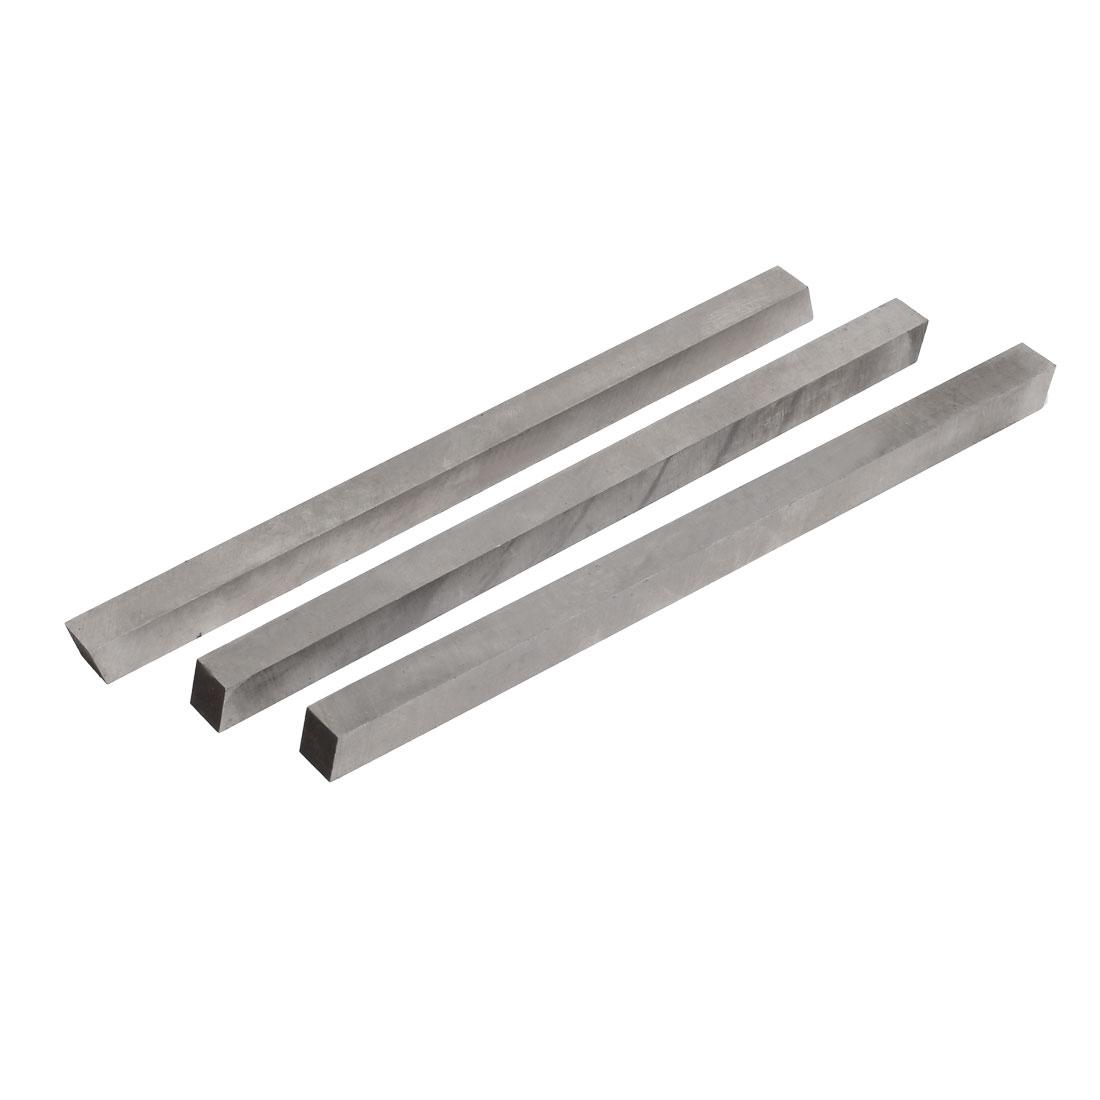 200mm Length 10mm Width HSS Turning Lathe Bit Cutting Tool Silver Tone 3pcs